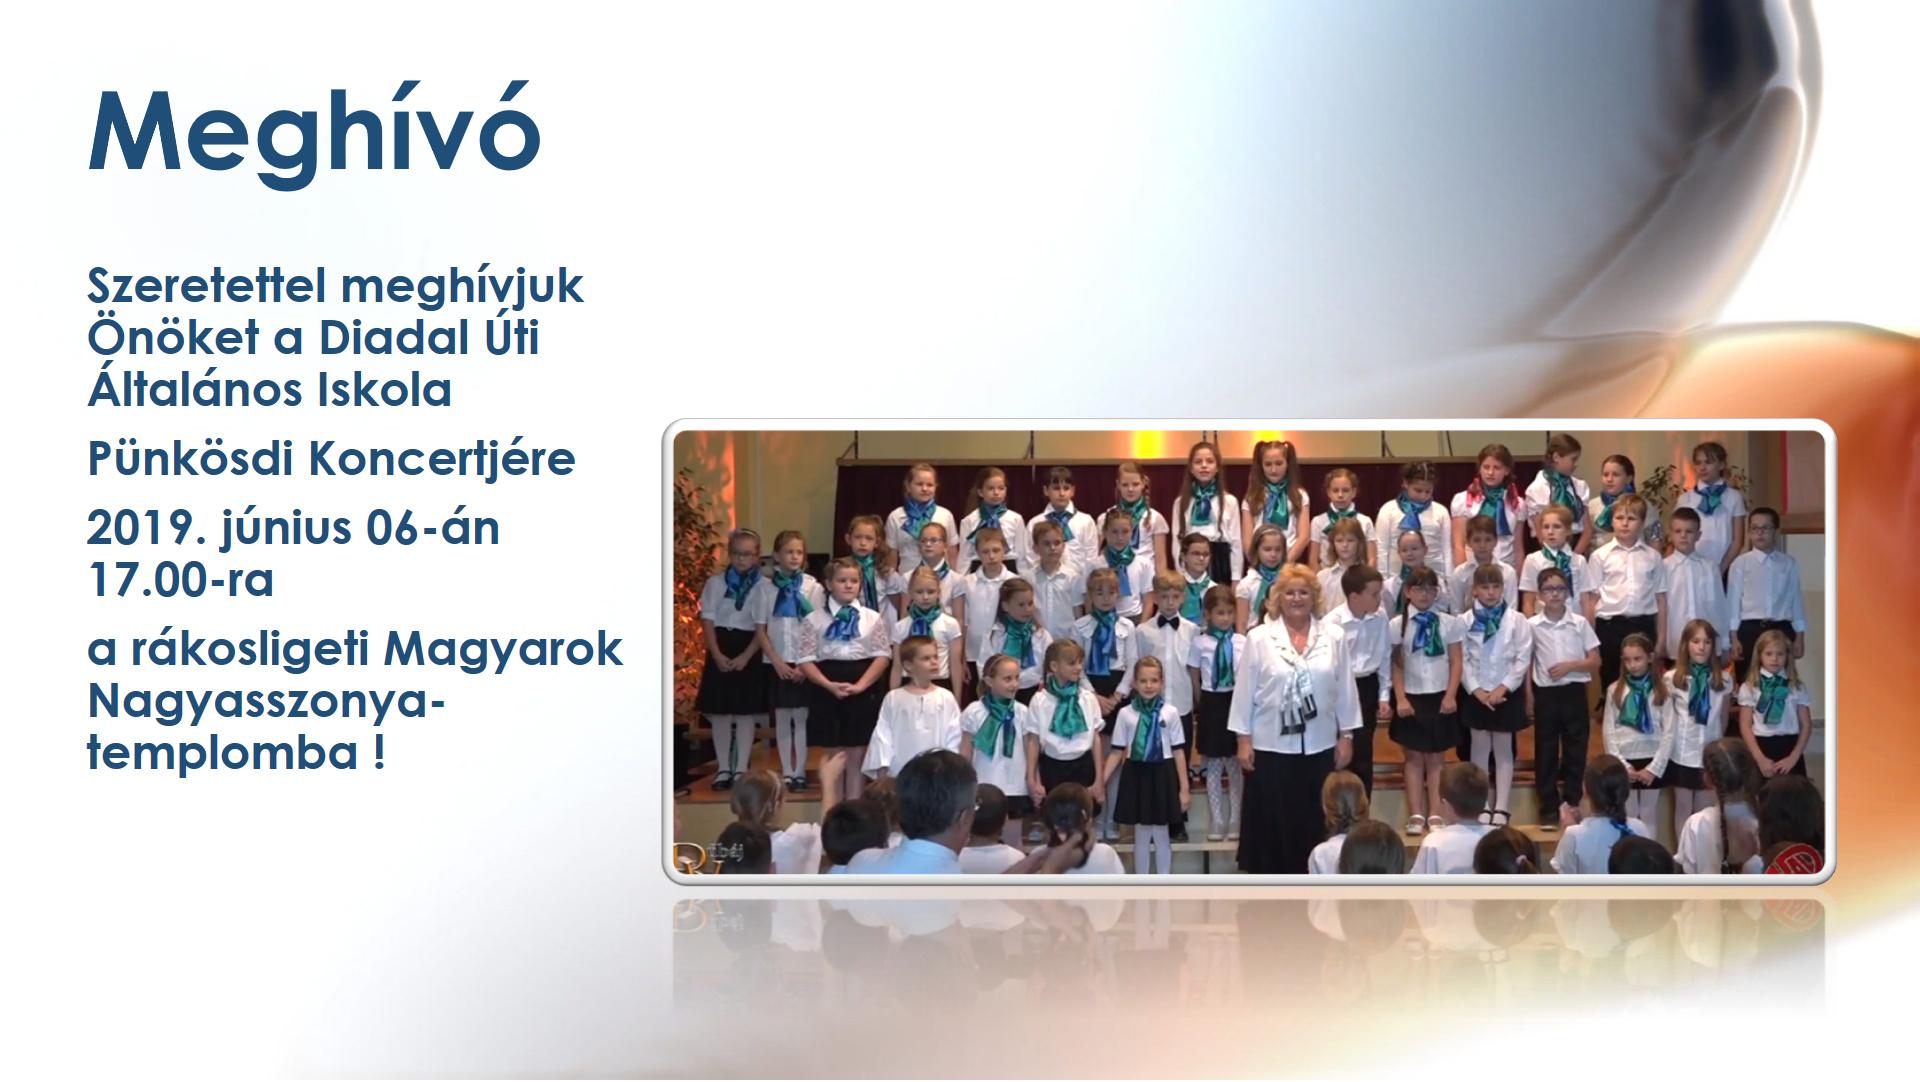 Diadal Úti Általános Iskola: Rákosligeti Pünkösdi Koncert 2019 - indafoto.hu